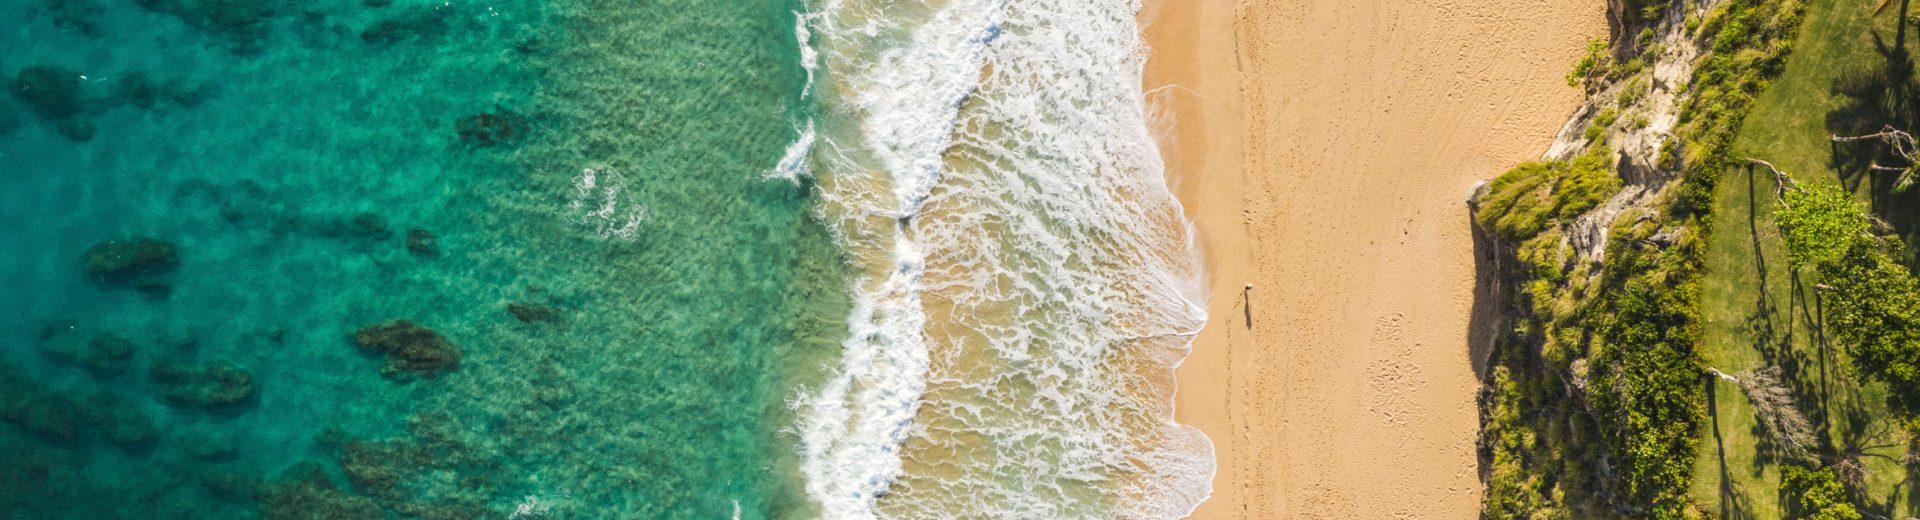 Amanera's beach in the Dominican Republic. Courtesy Aman Resorts